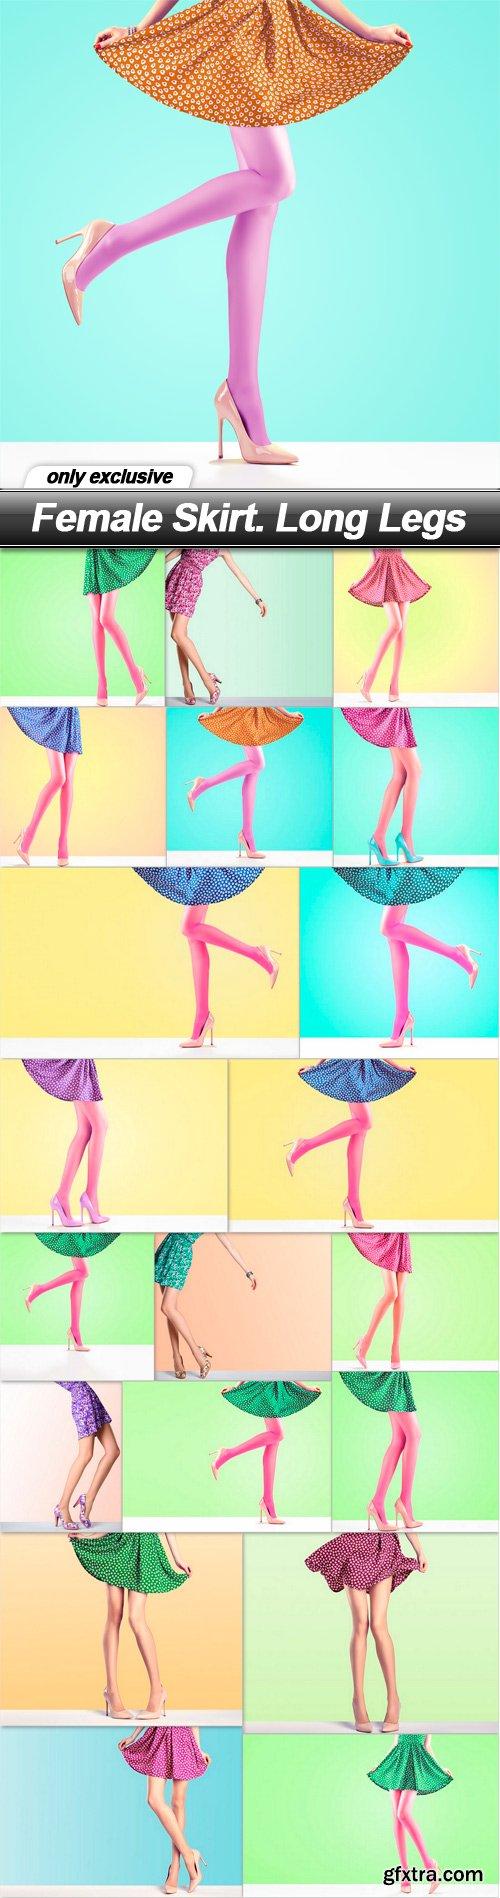 Female Skirt. Long Legs - 20 UHQ JPEG